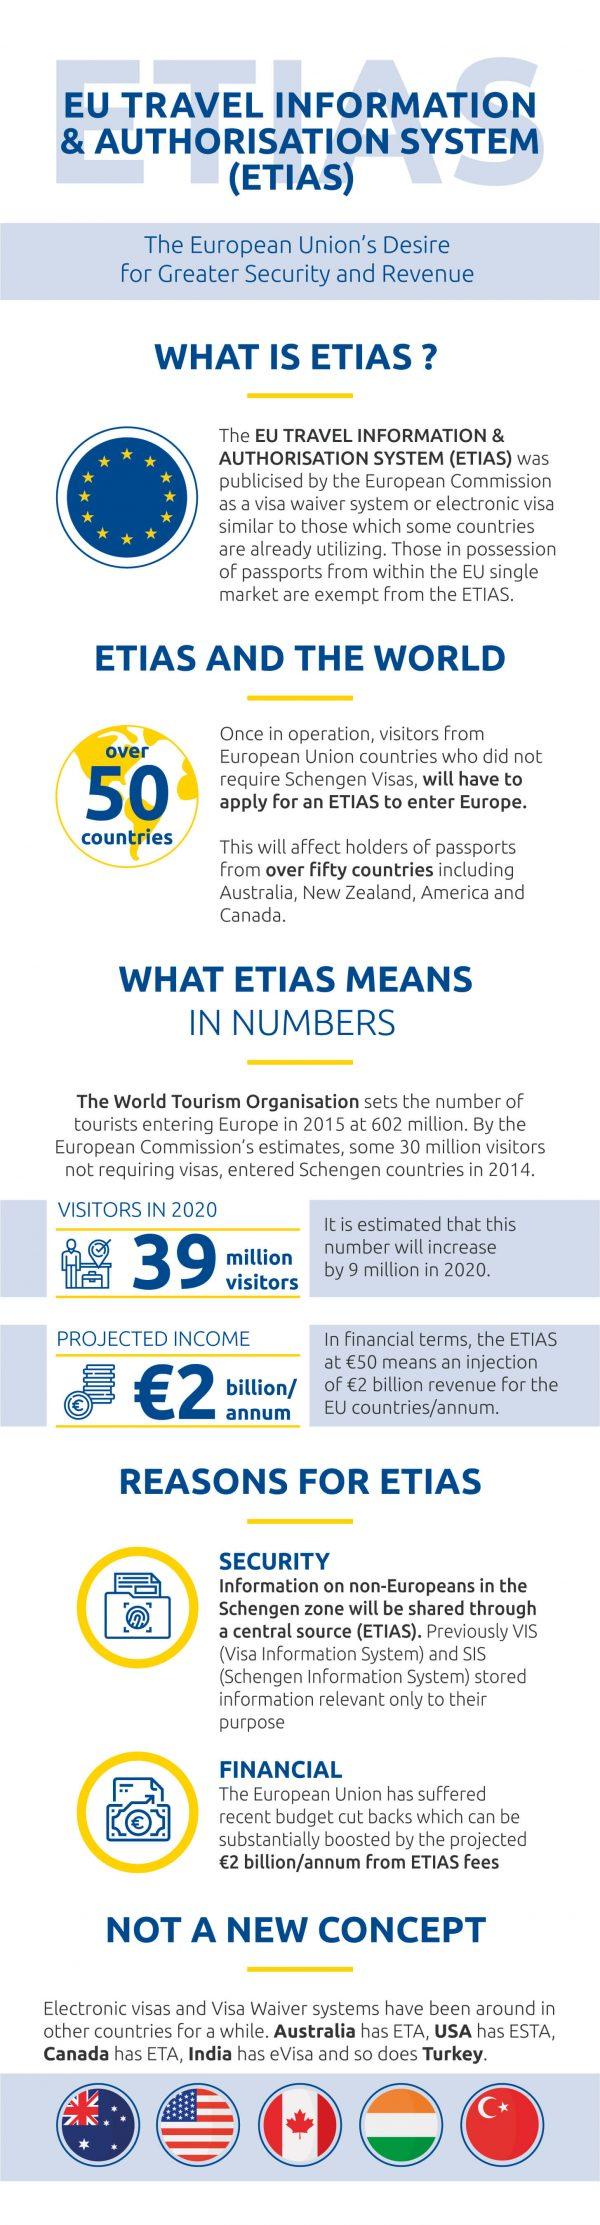 About ETIAS